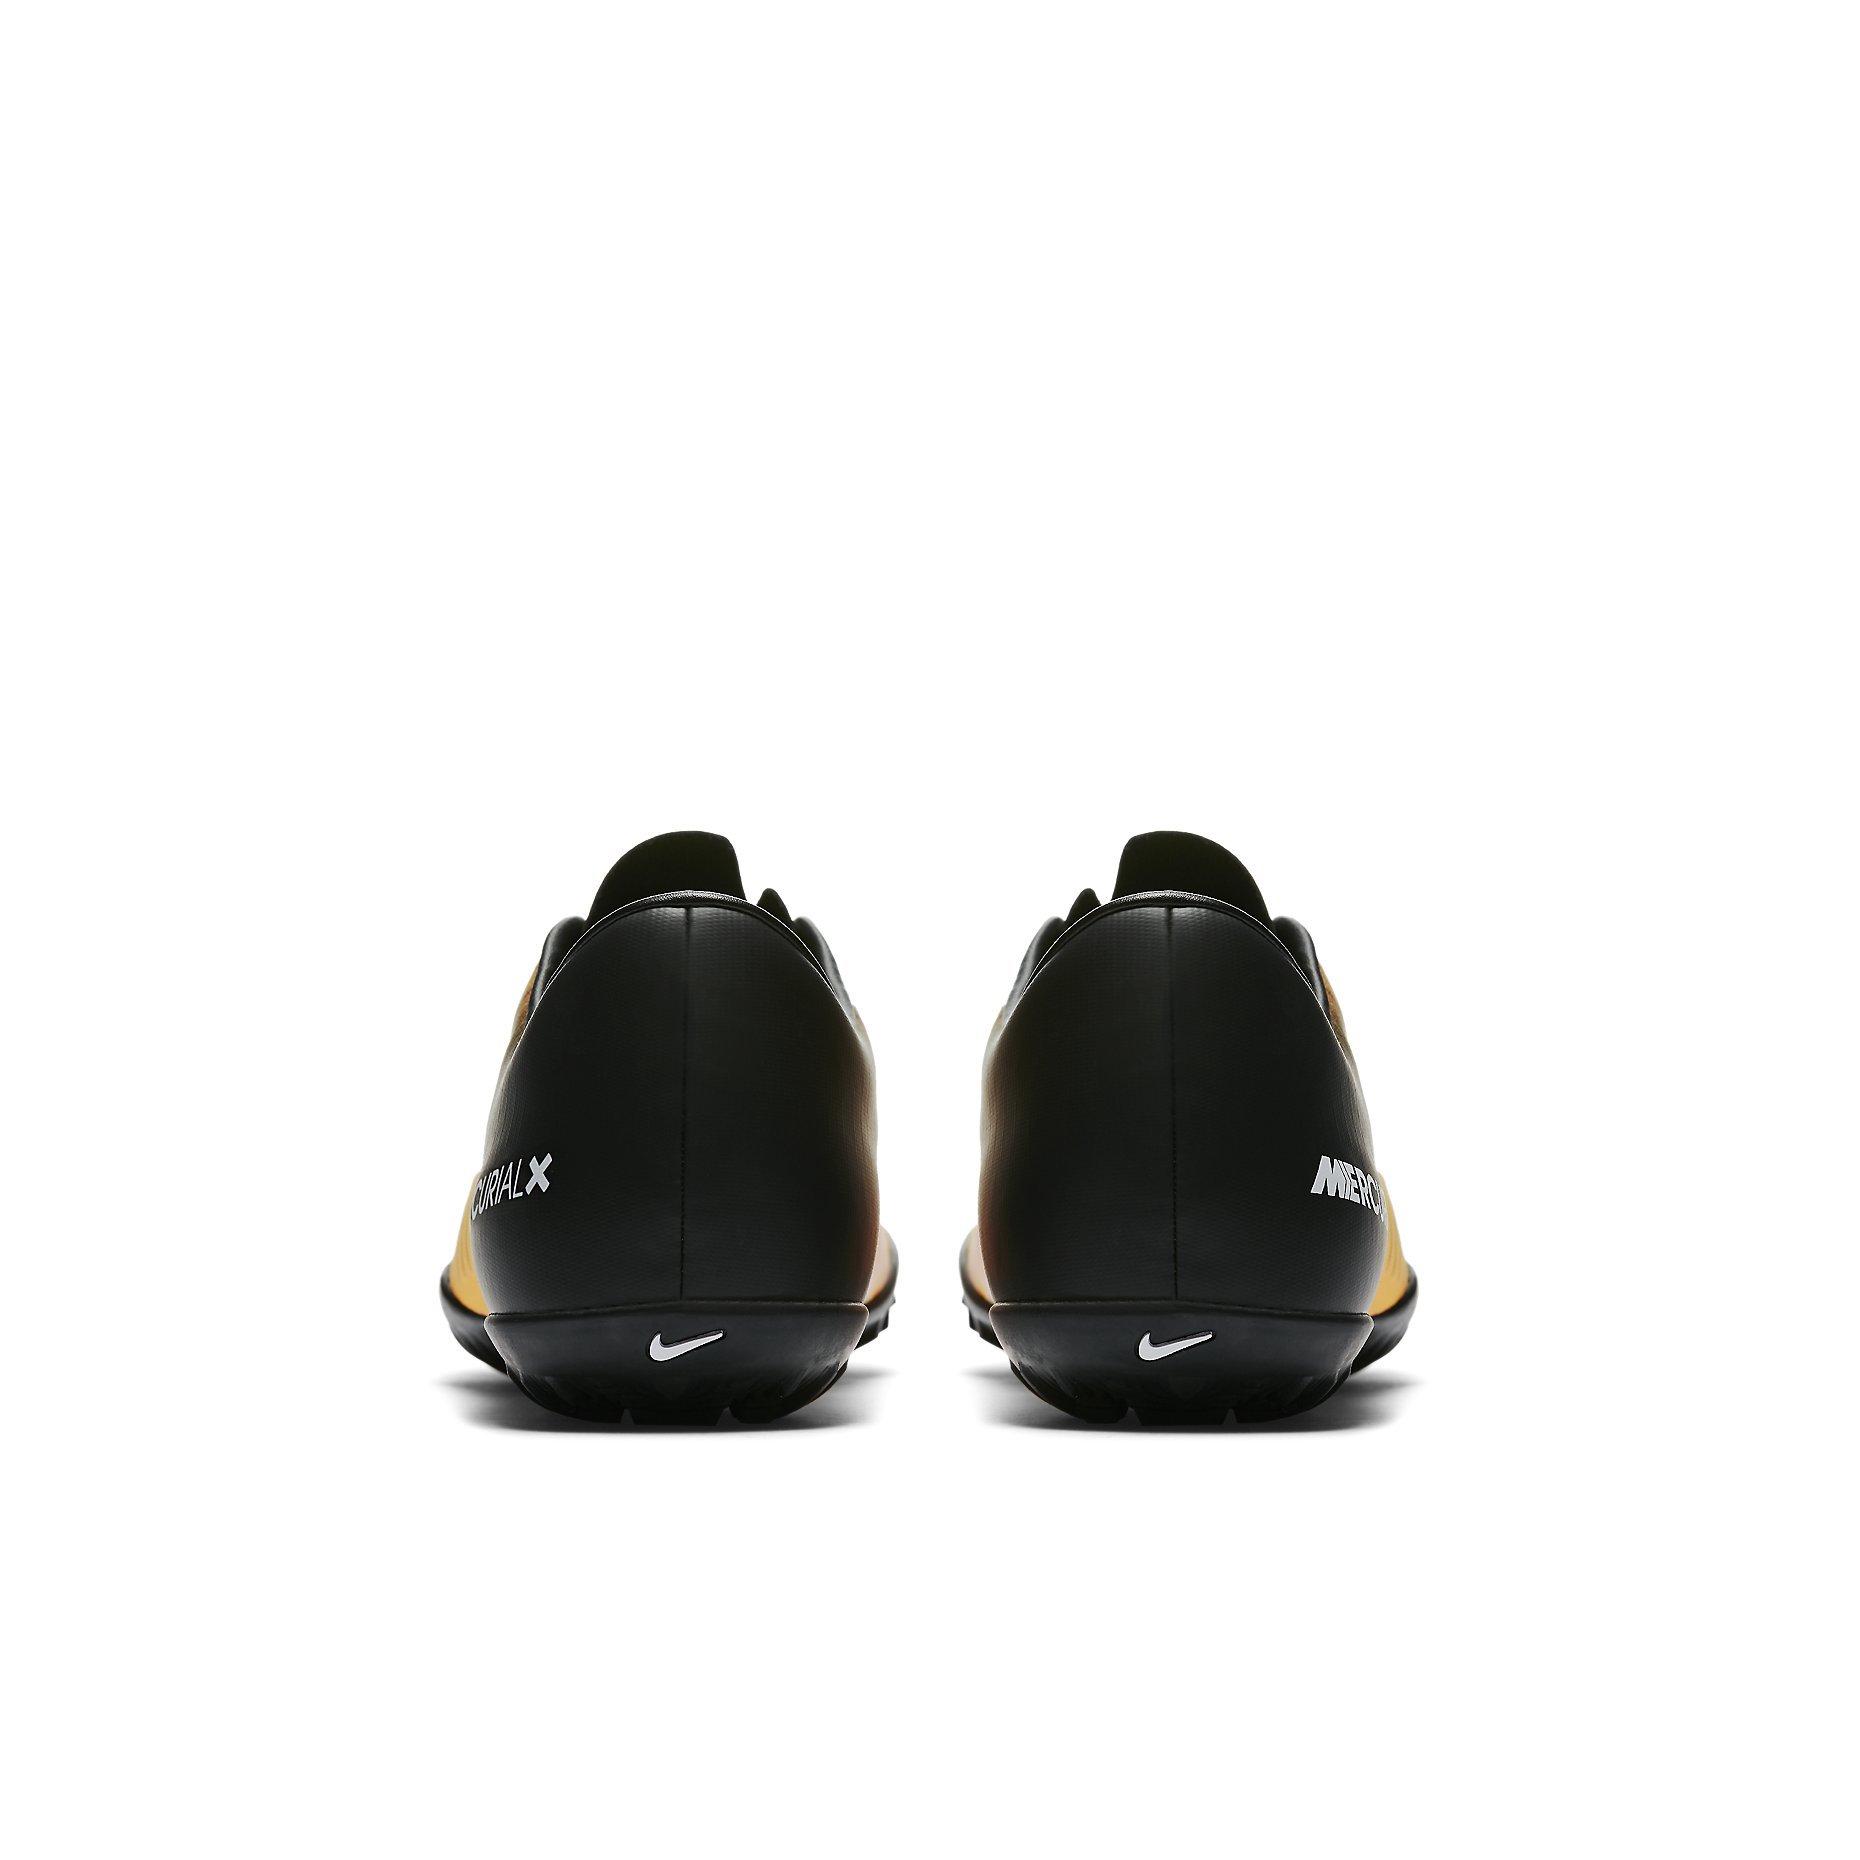 Football shoes Nike MERCURIALX VICTORY VI TF